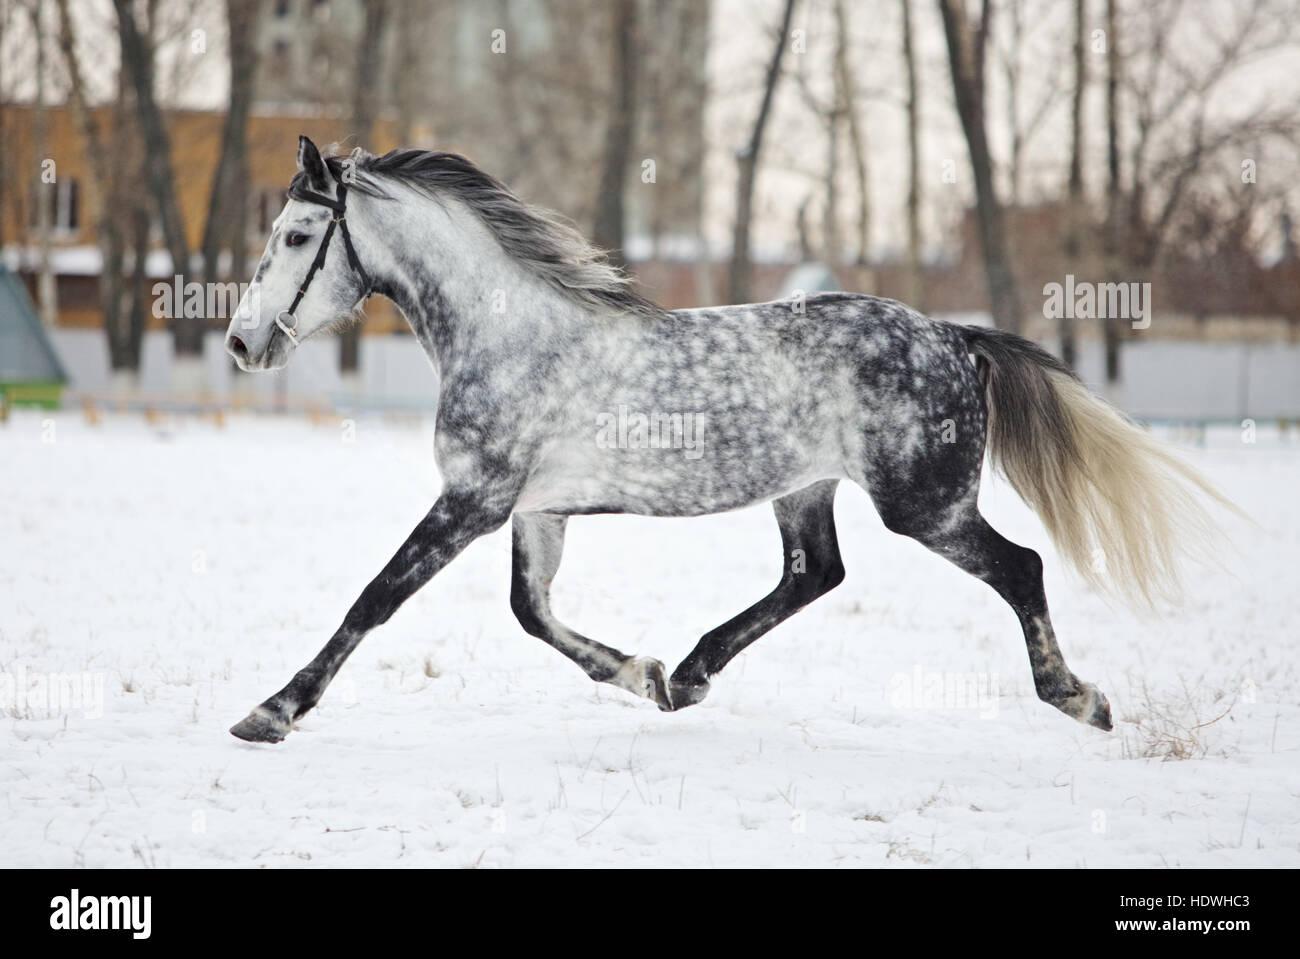 dapple grey arabian horse in motion on snow field stock photo